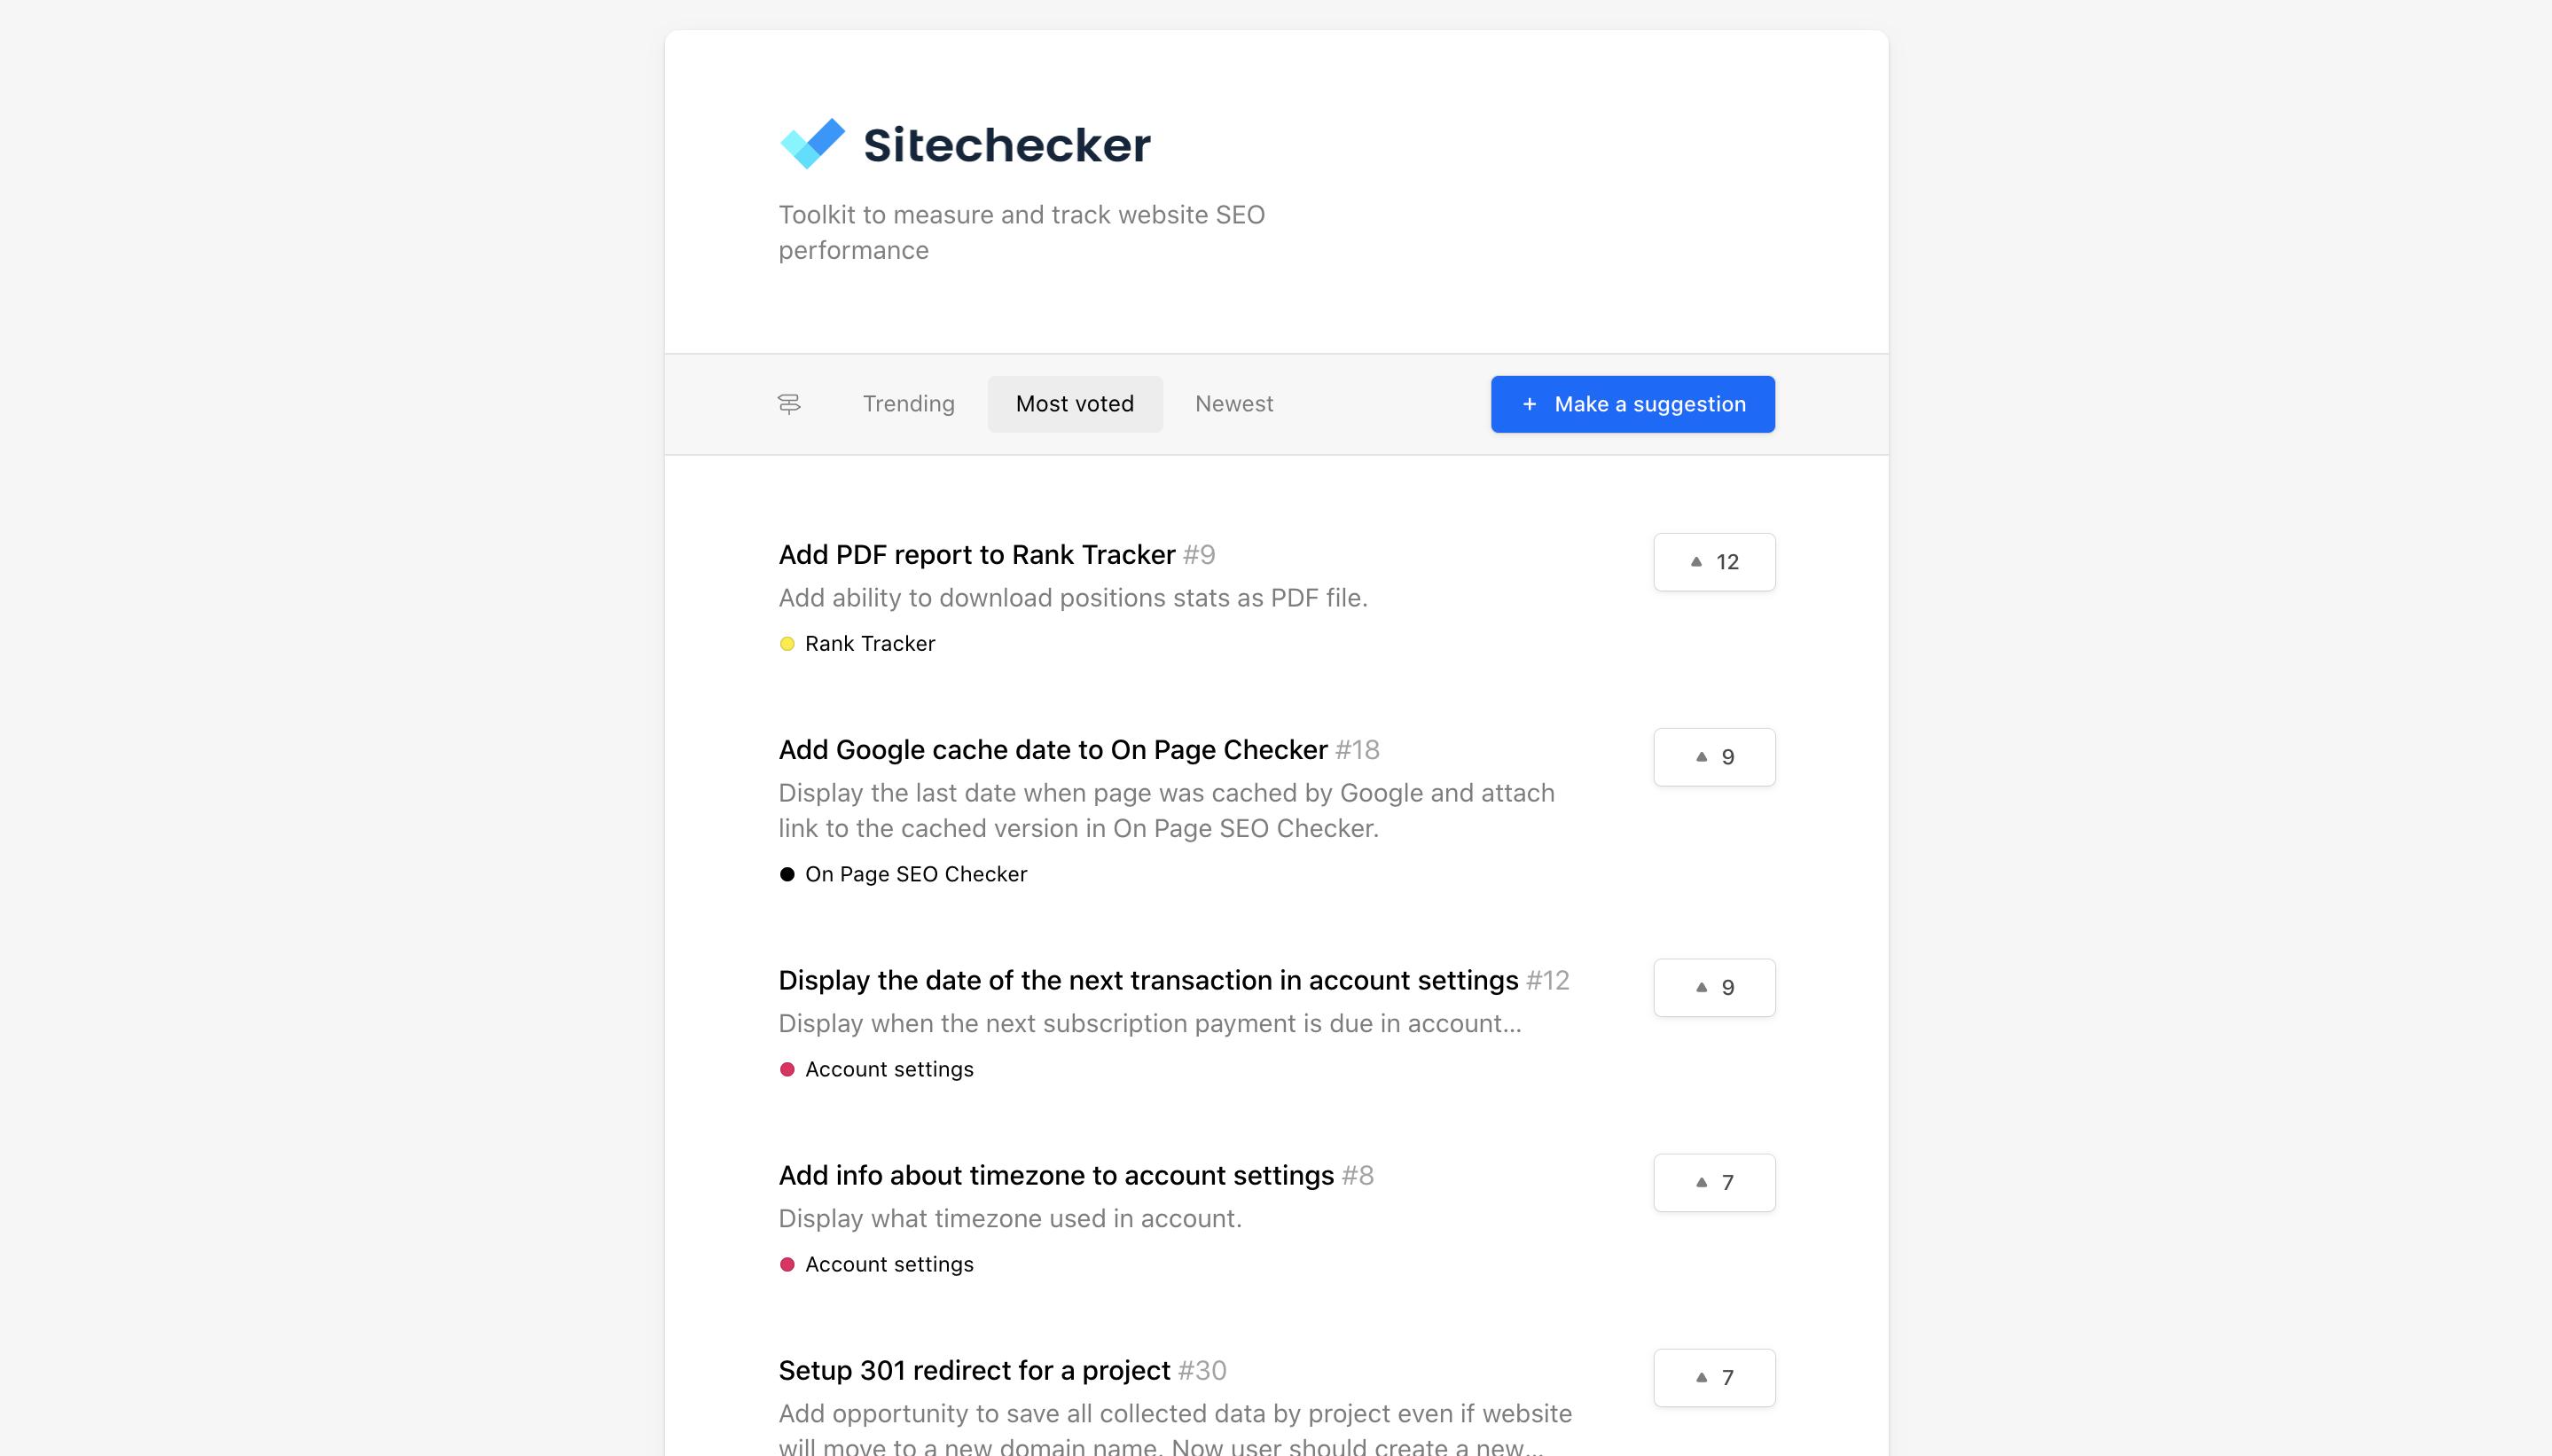 sitechecker features roadmap